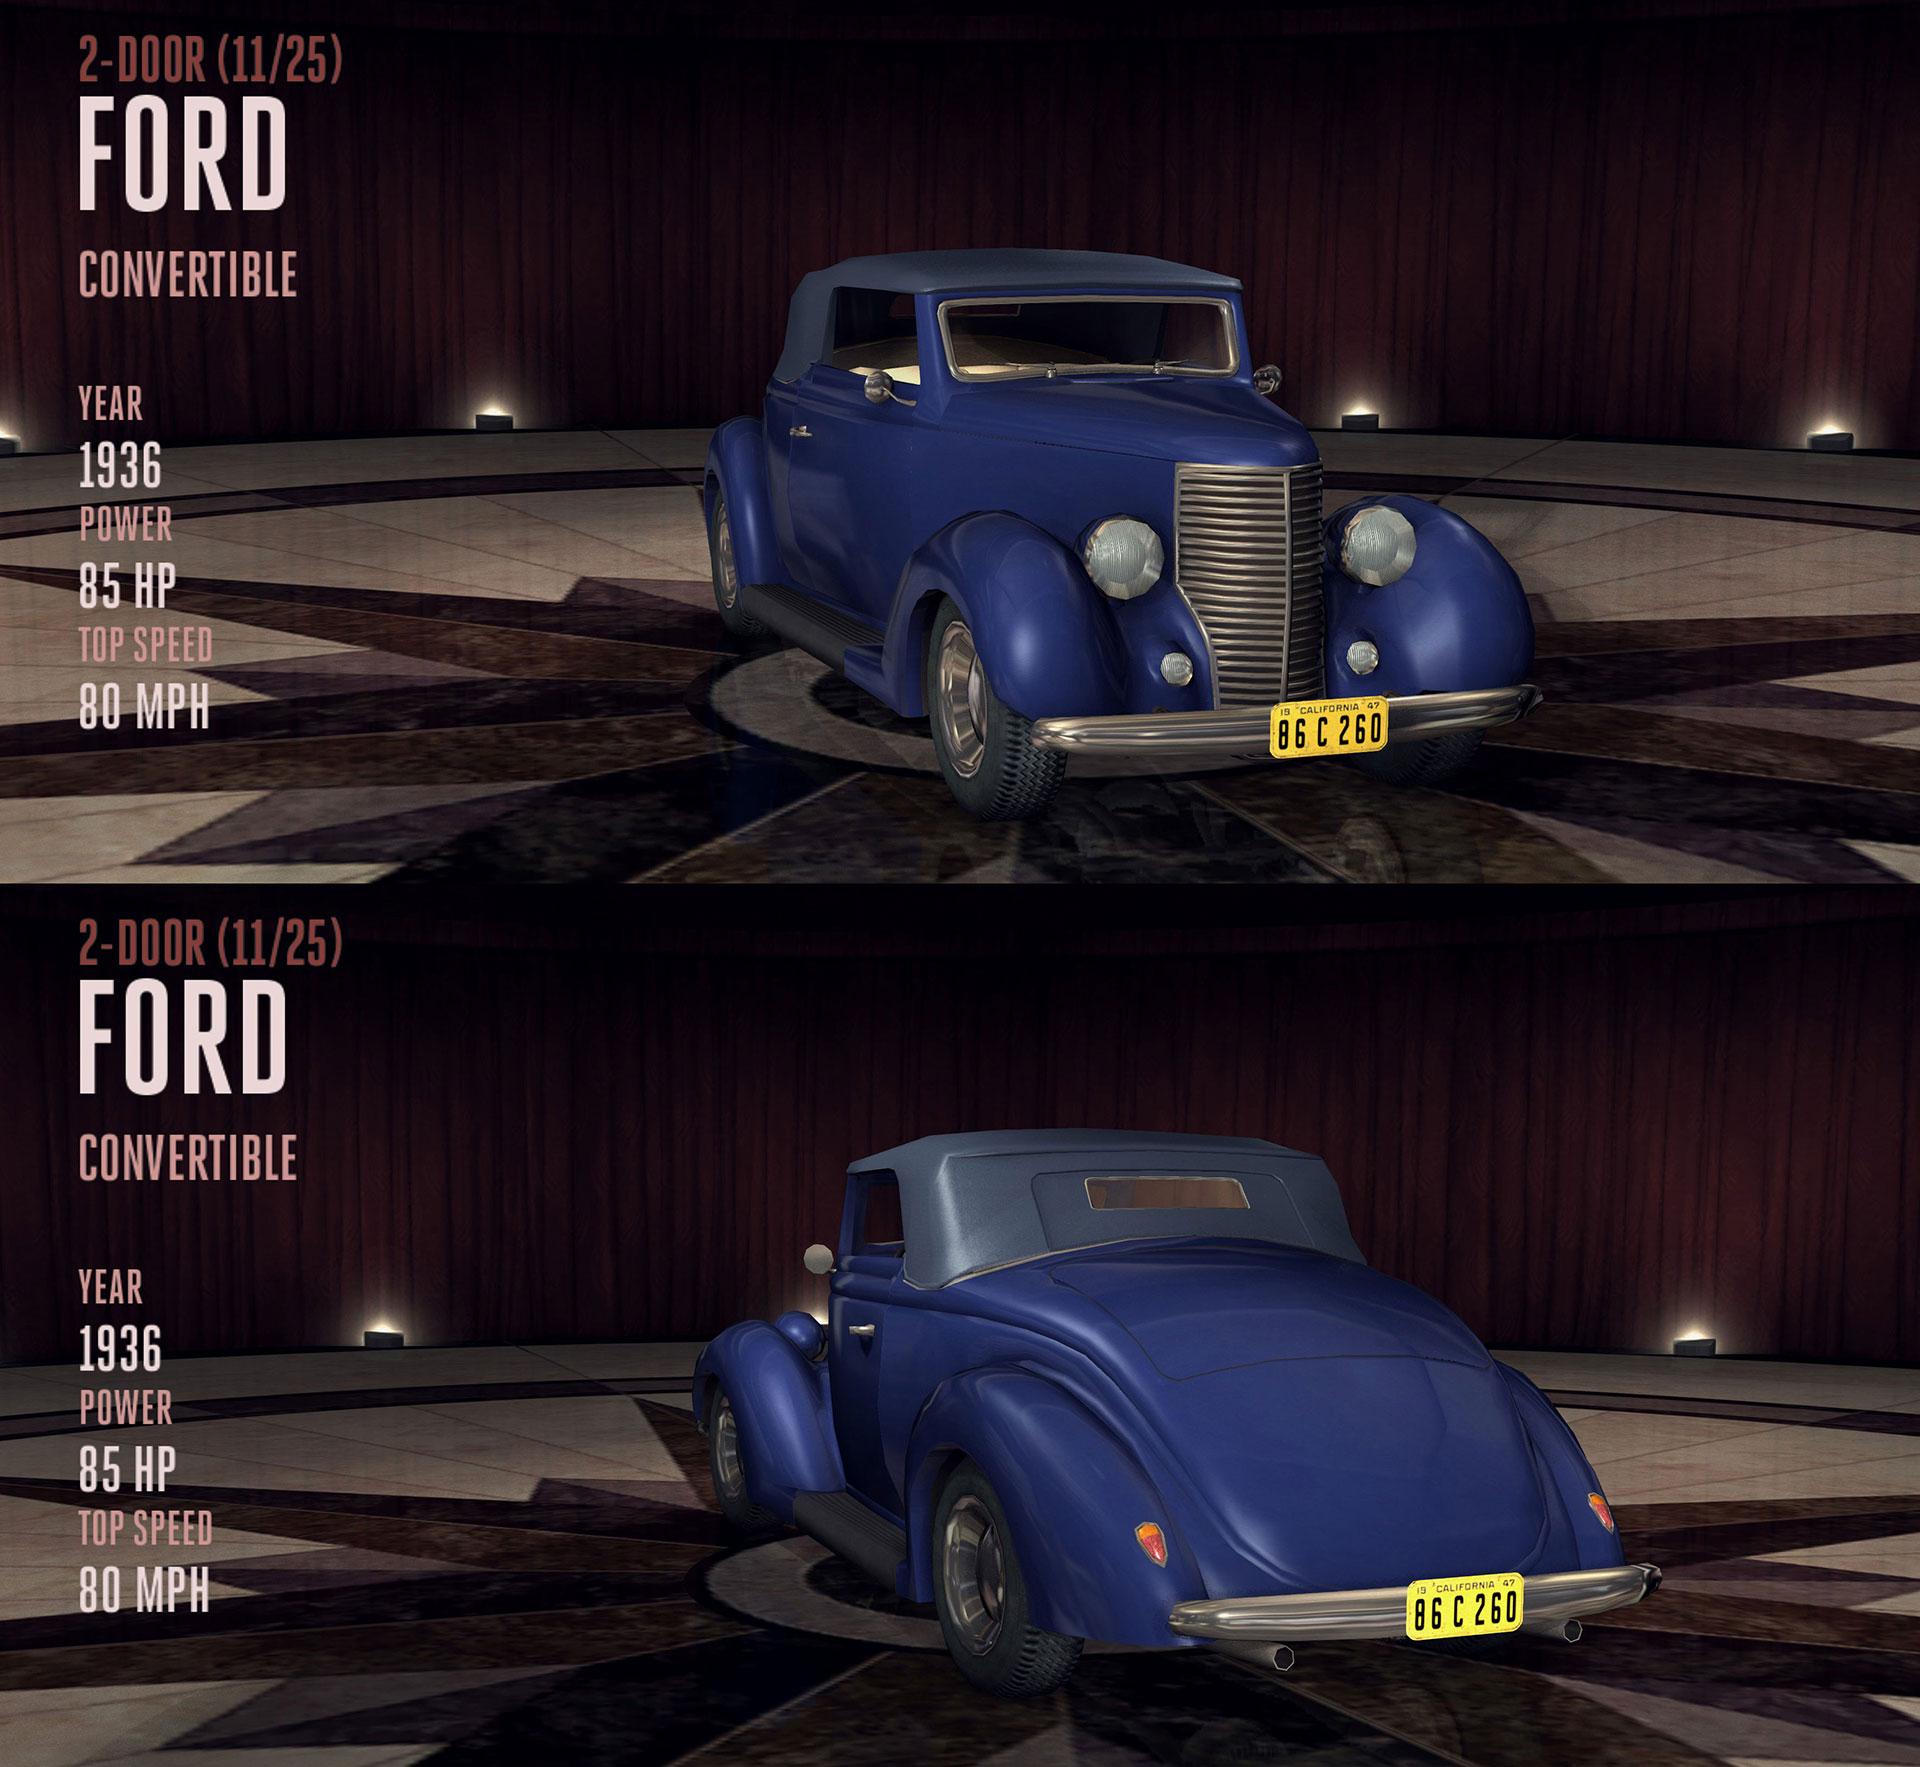 Ford Convertible L A Noire Wiki Fandom